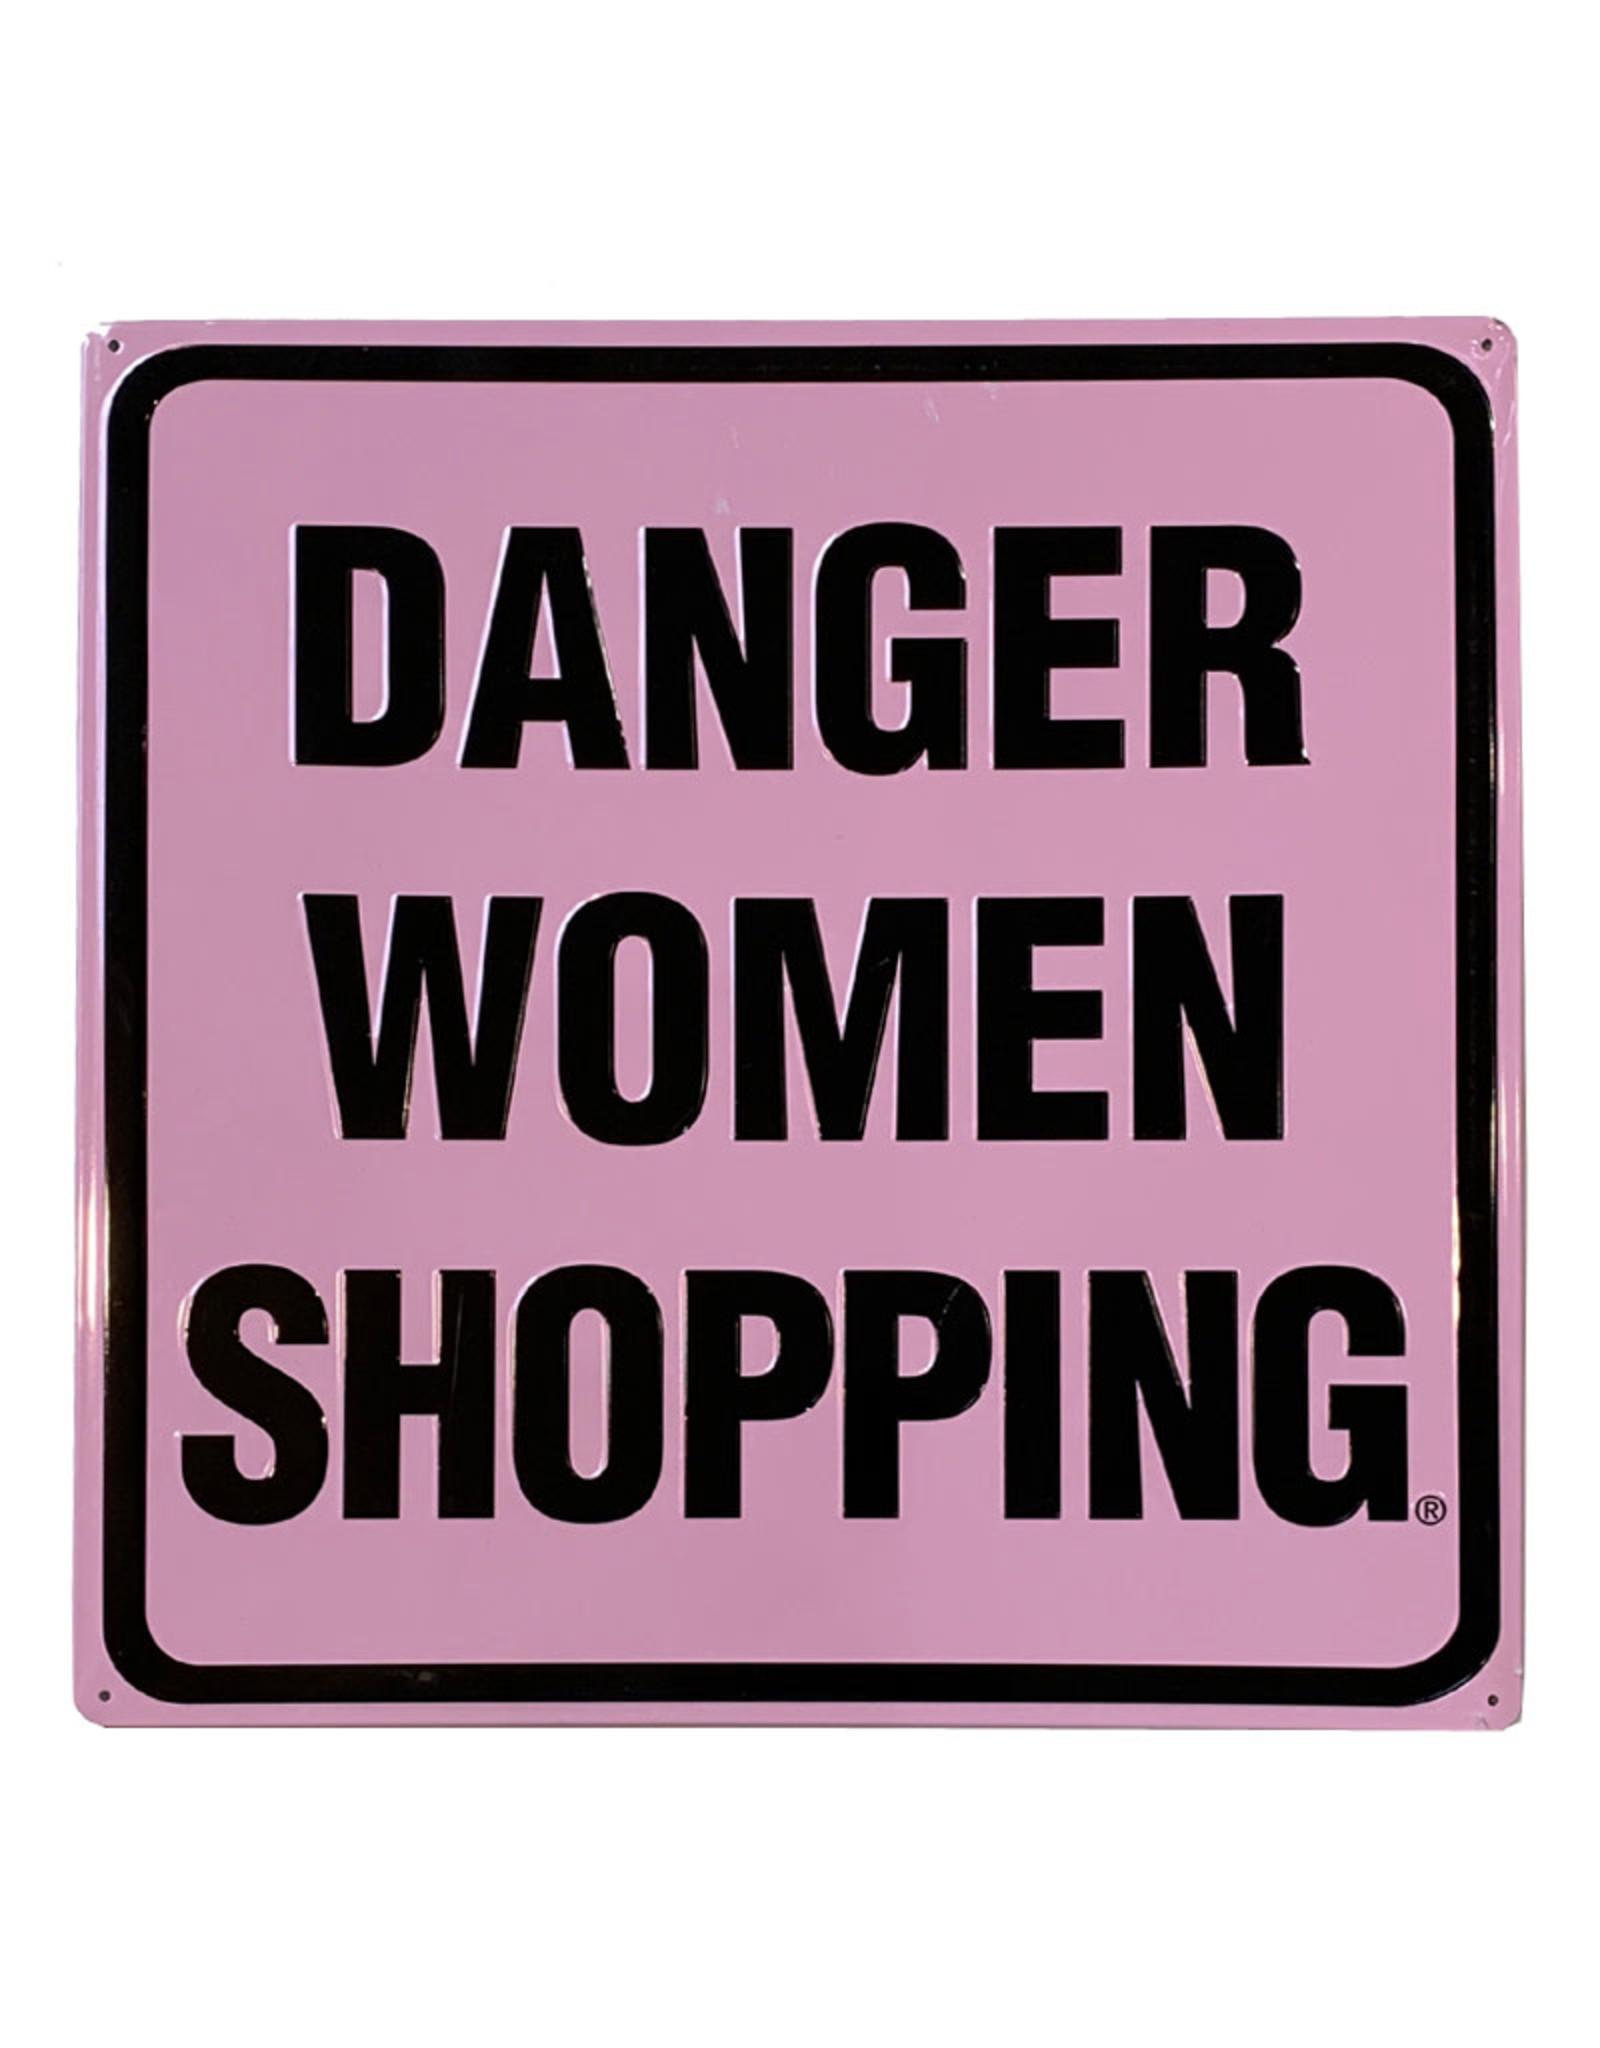 Danger Women Shopping  ( Embossed Metal Plate )